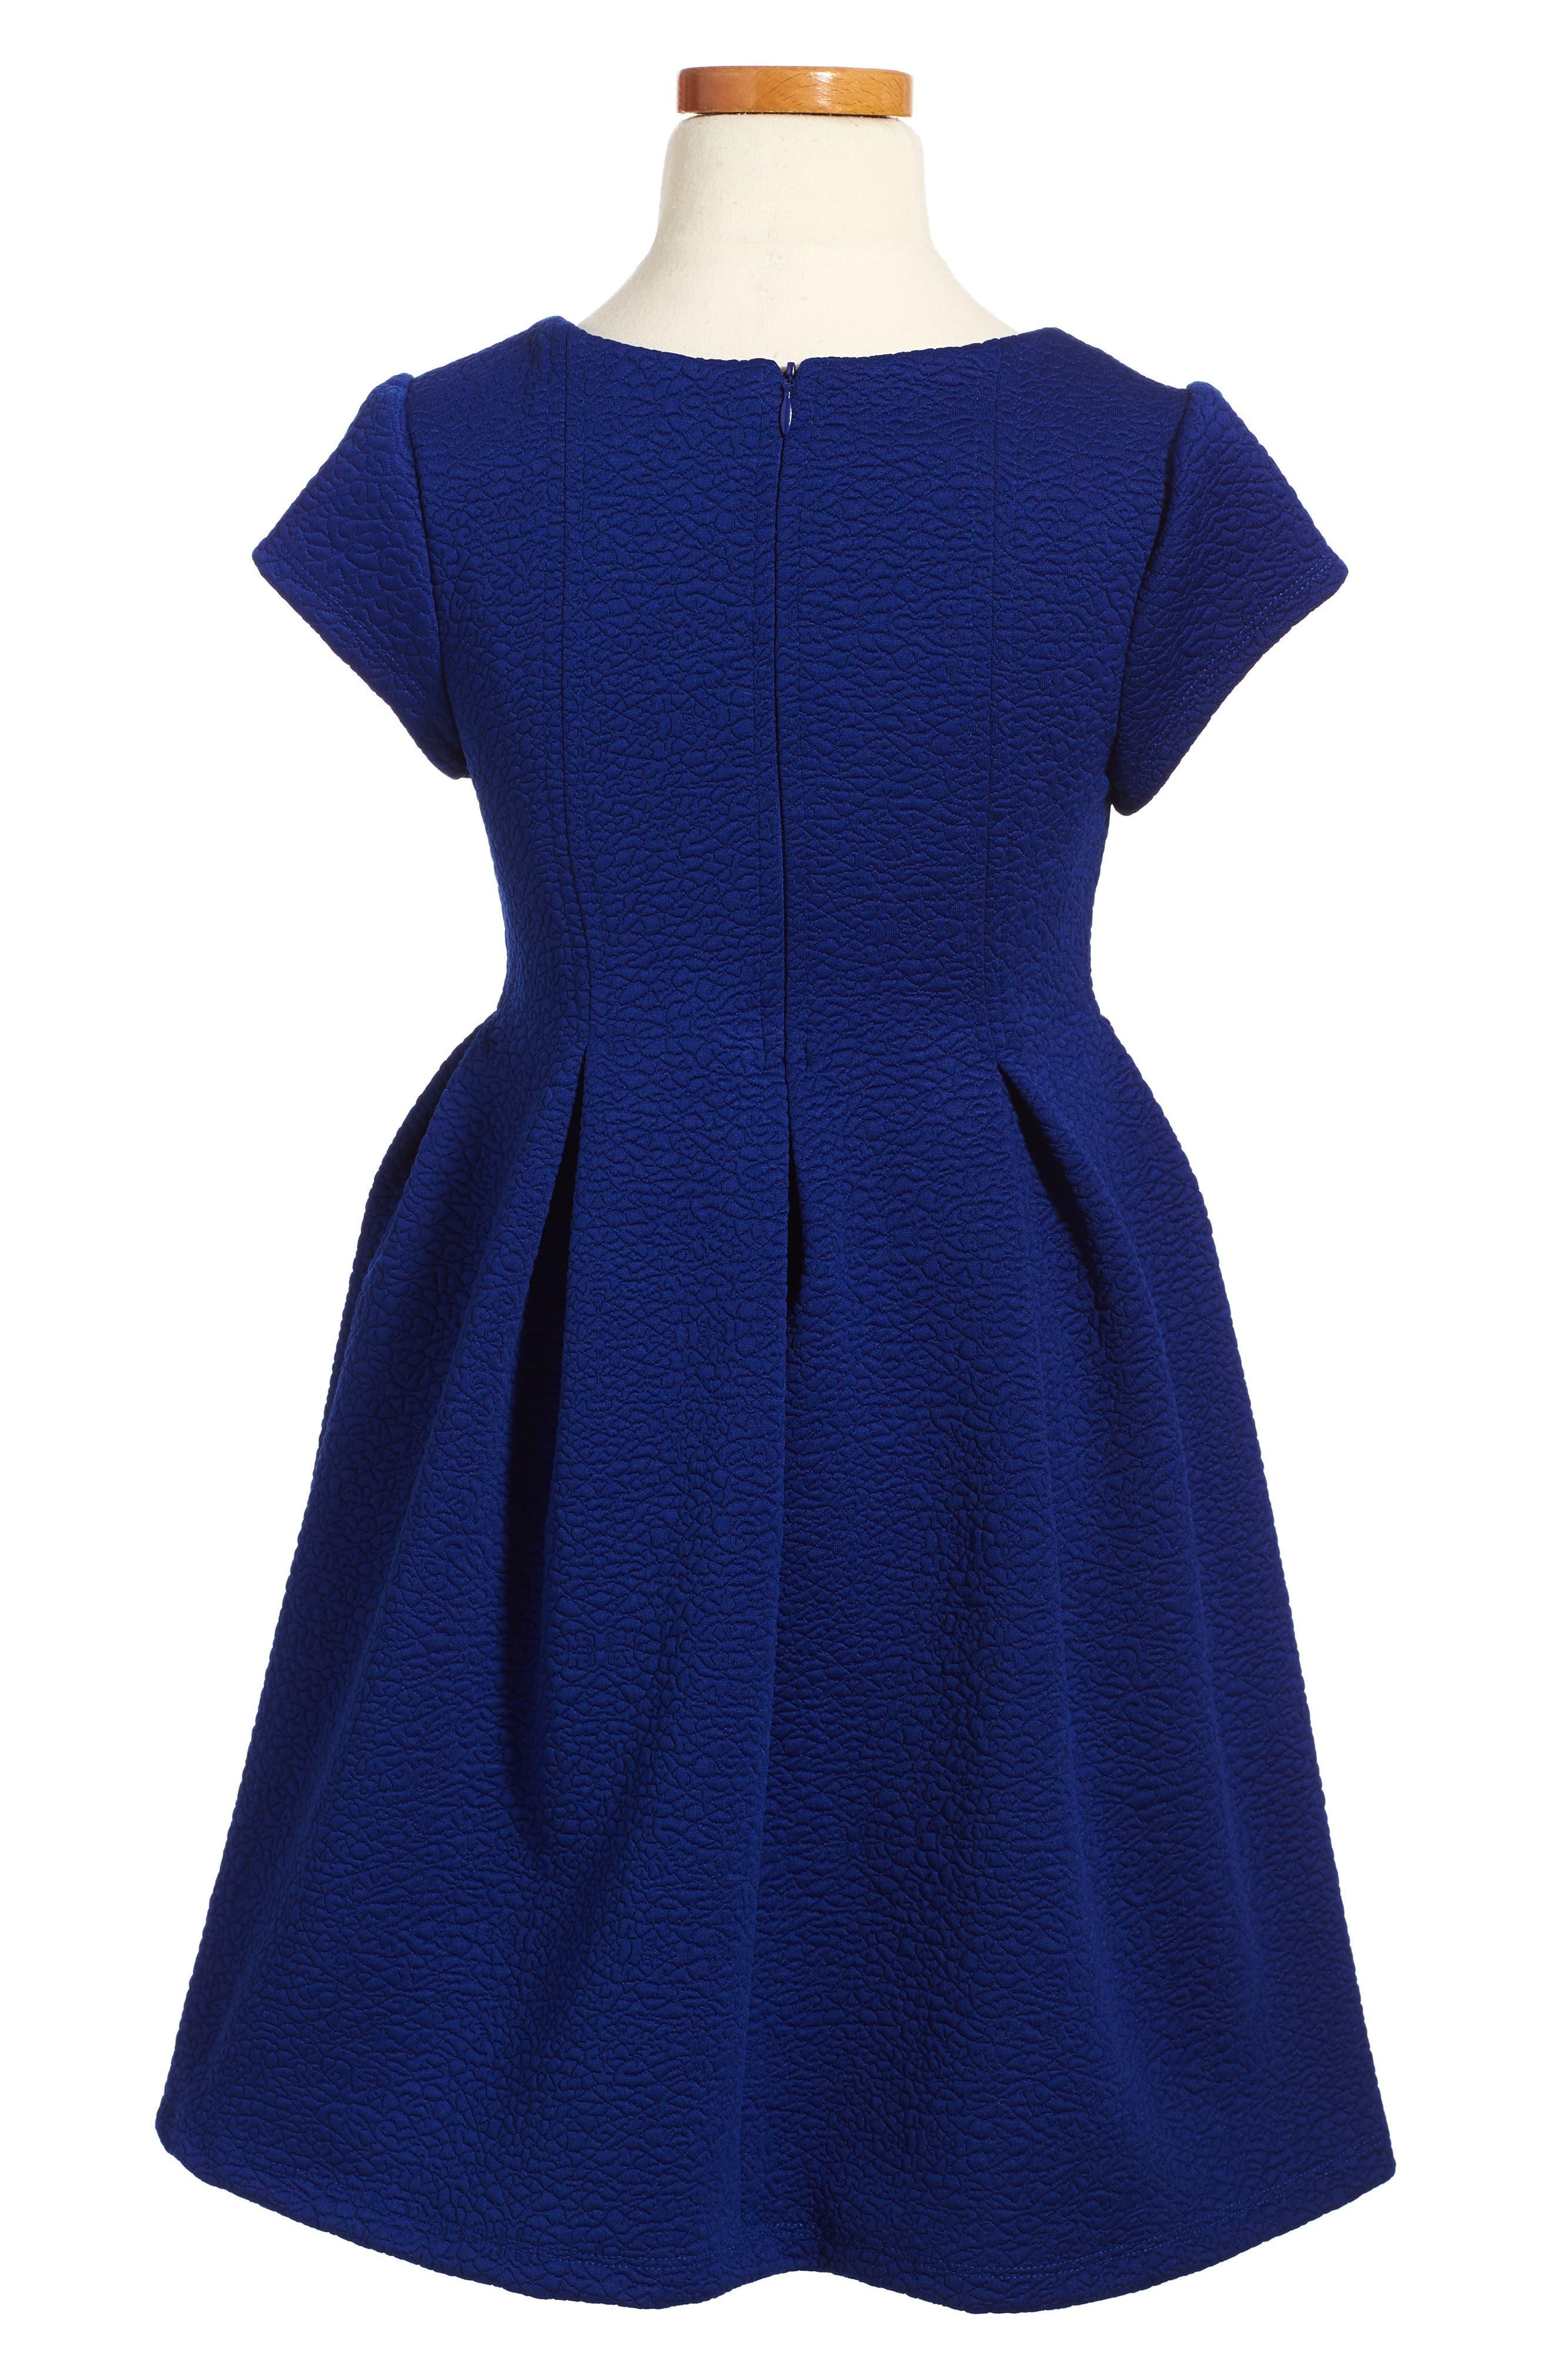 Pleated Knit Dress,                             Alternate thumbnail 2, color,                             Royal